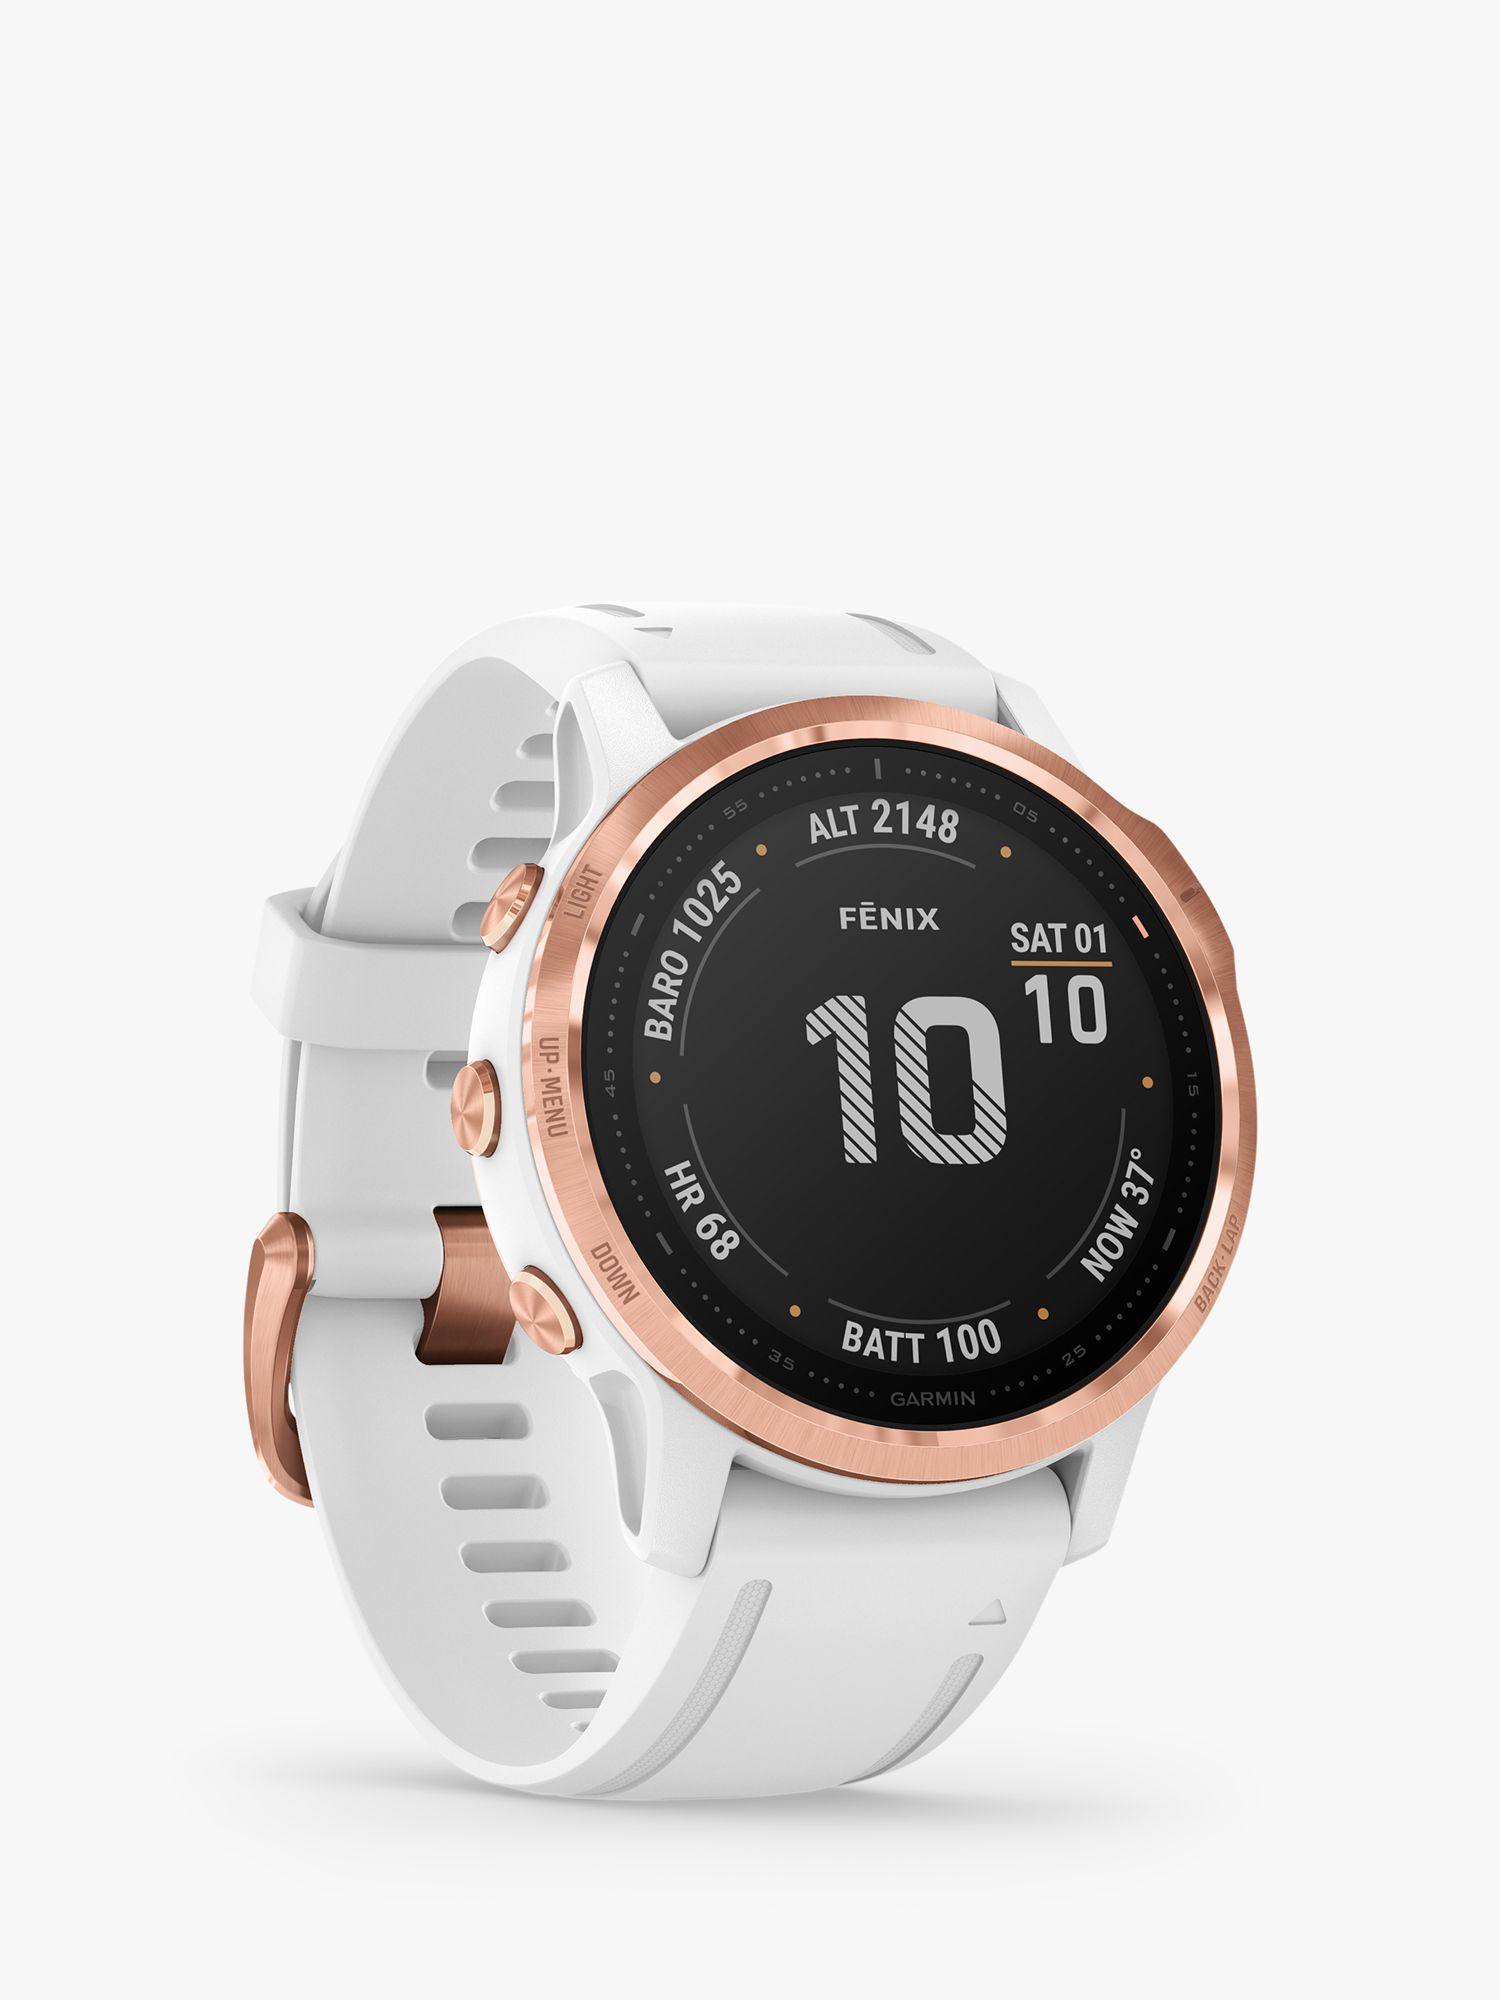 Garmin Garmin fēnix 6S Pro GPS, 42mm, Multisport Watch